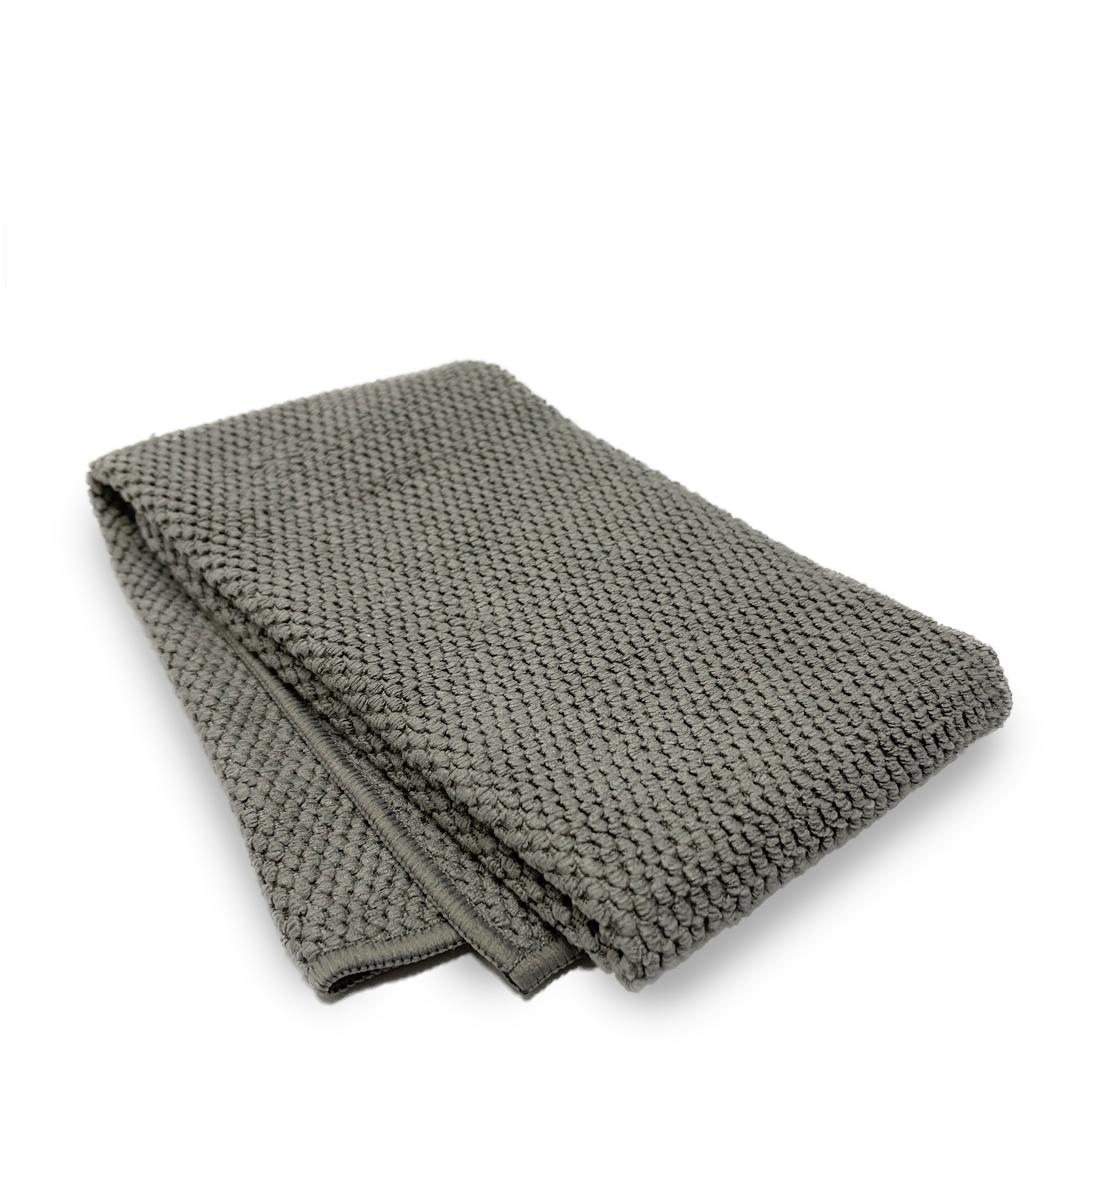 Diamond Textured Kitchen Towel, mushroom